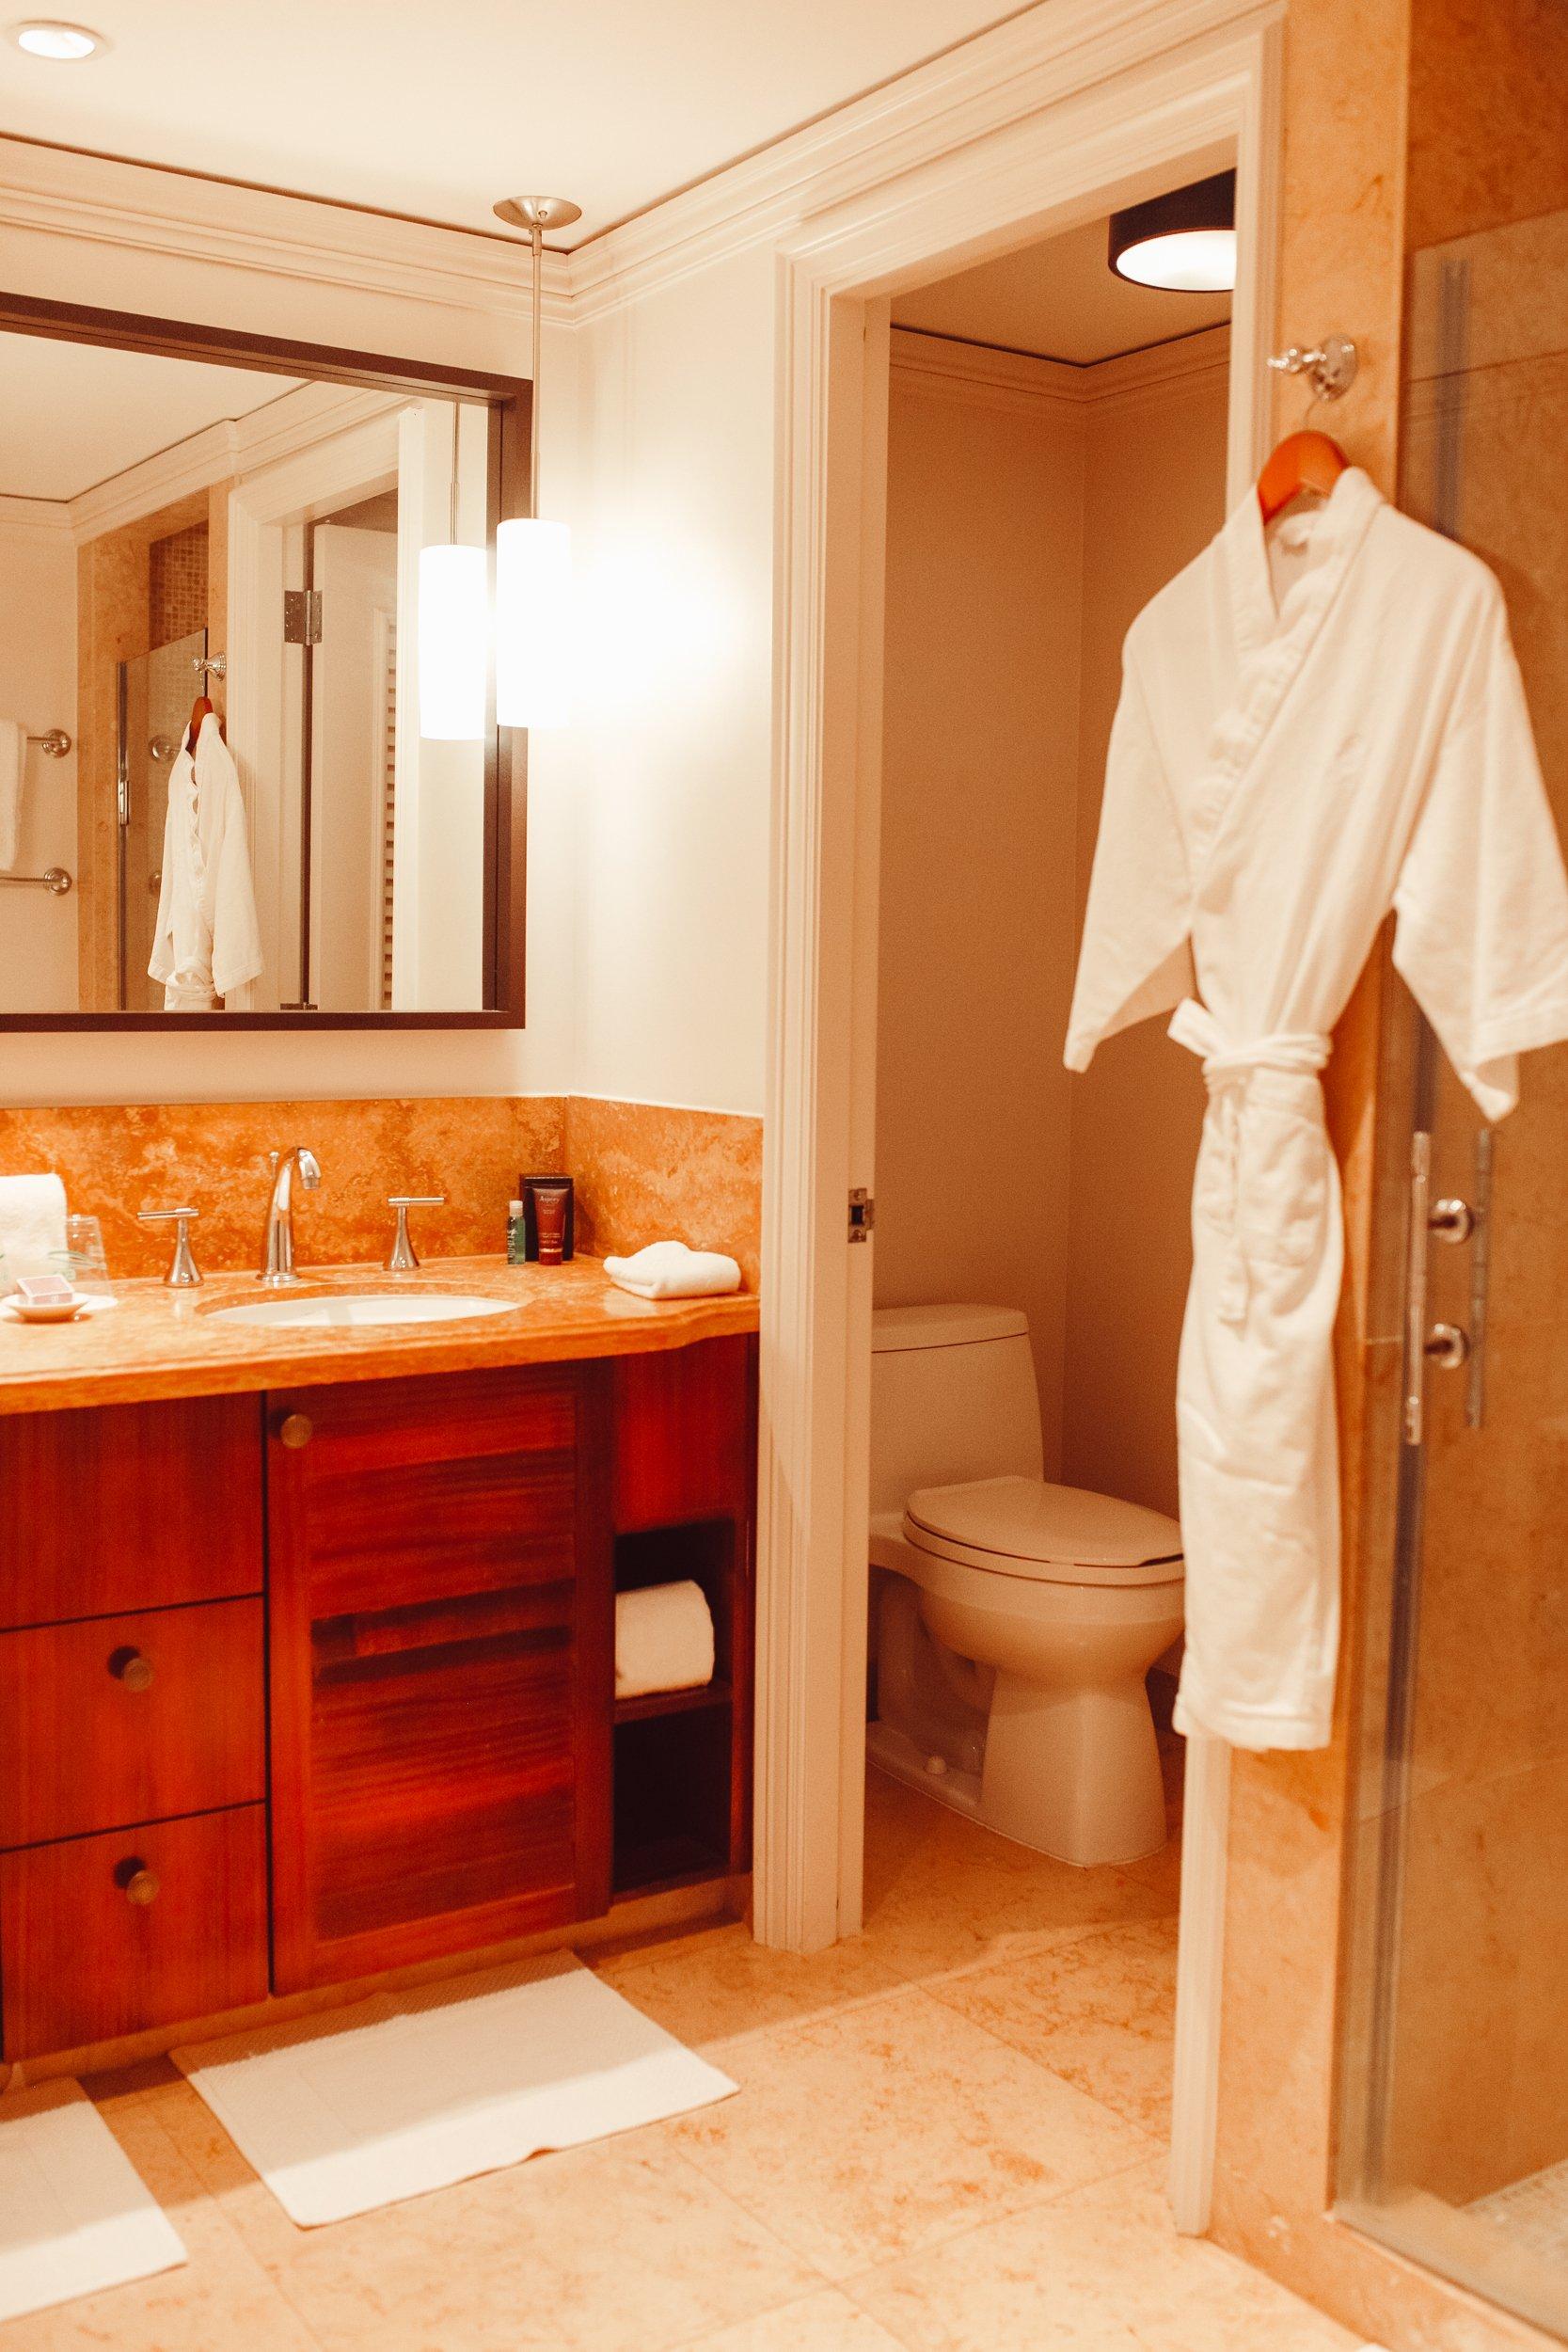 hotel restroom with bath robe